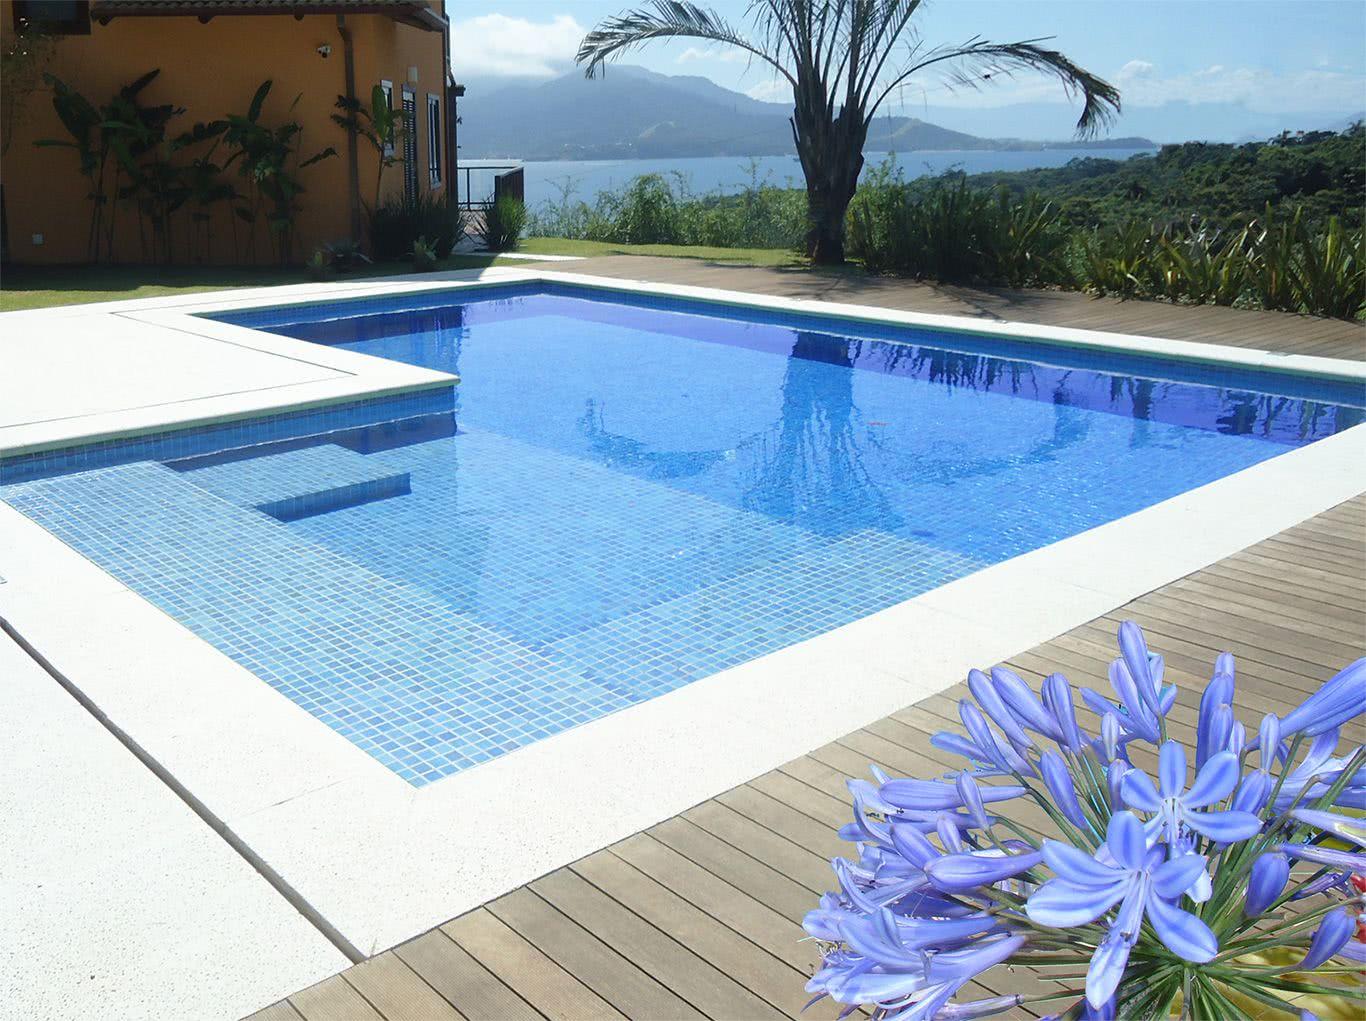 Piscina de vinil o que vantagens e fotos para se inspirar for Modelos de piscinas fotos